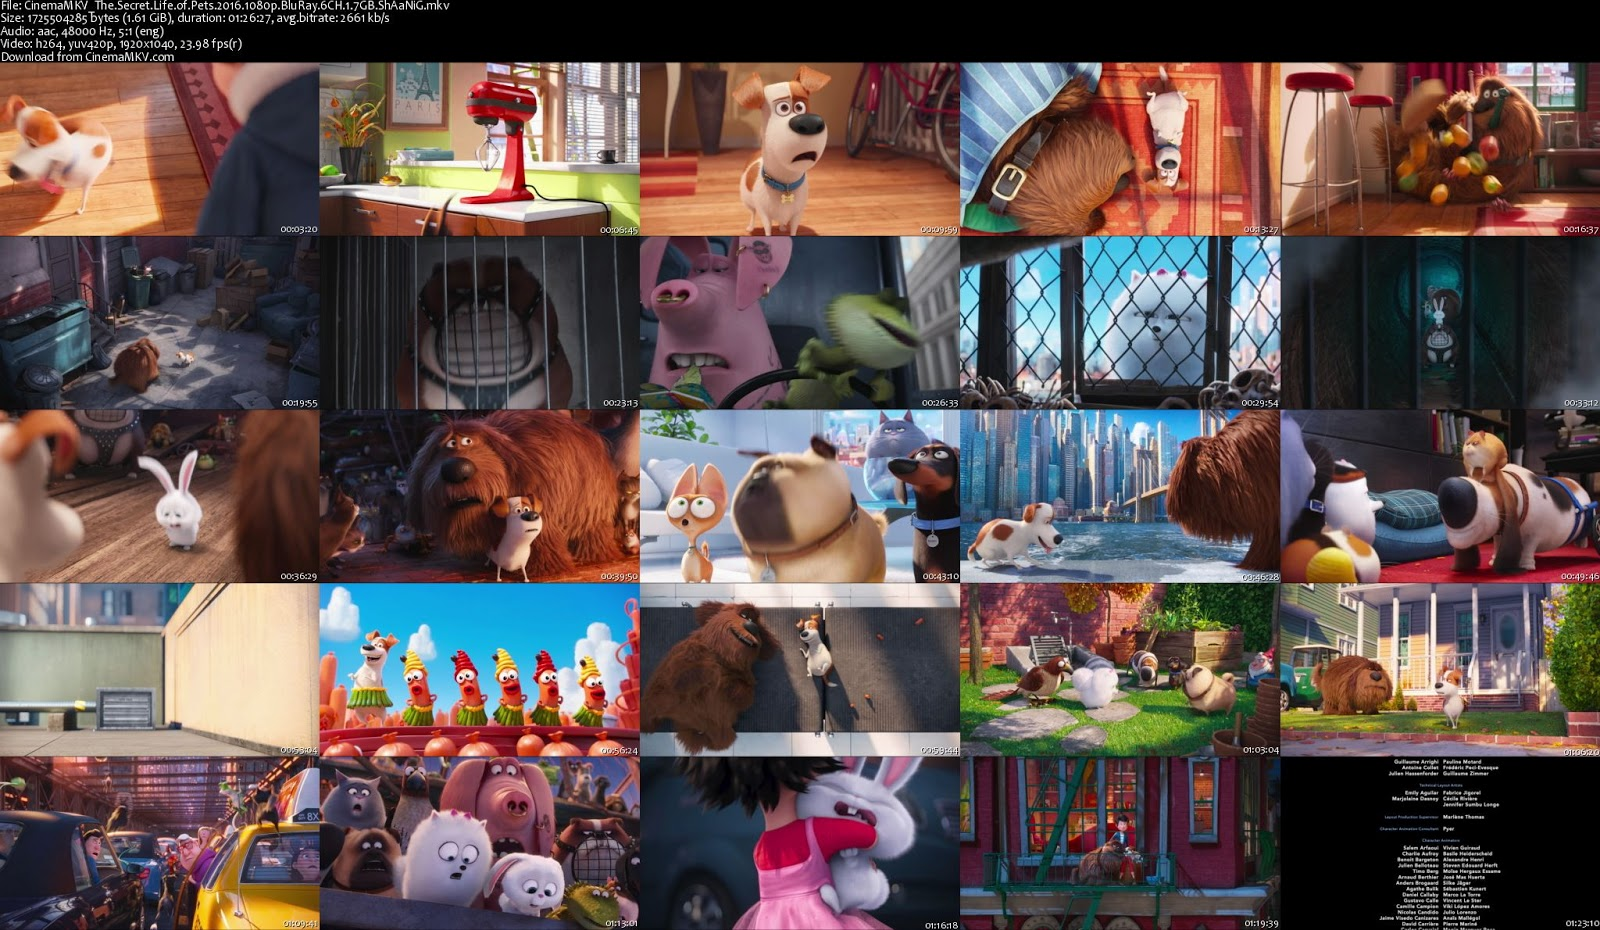 secret life of pets download 1080p